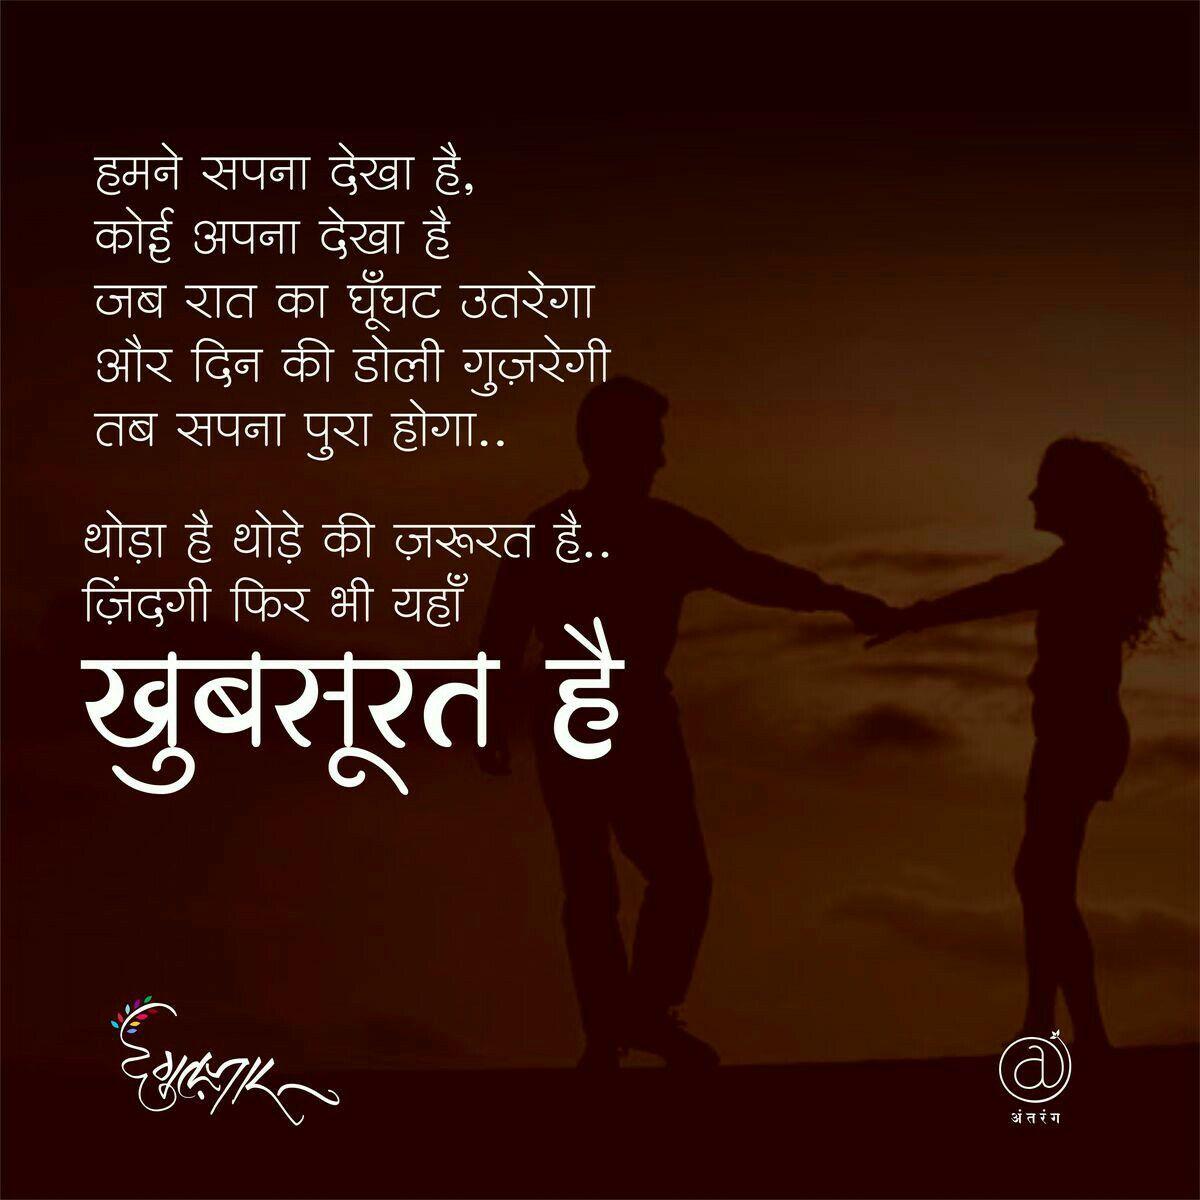 Pin by Bhavin Patel on Bhavin | Gulzar quotes, Hindi quotes